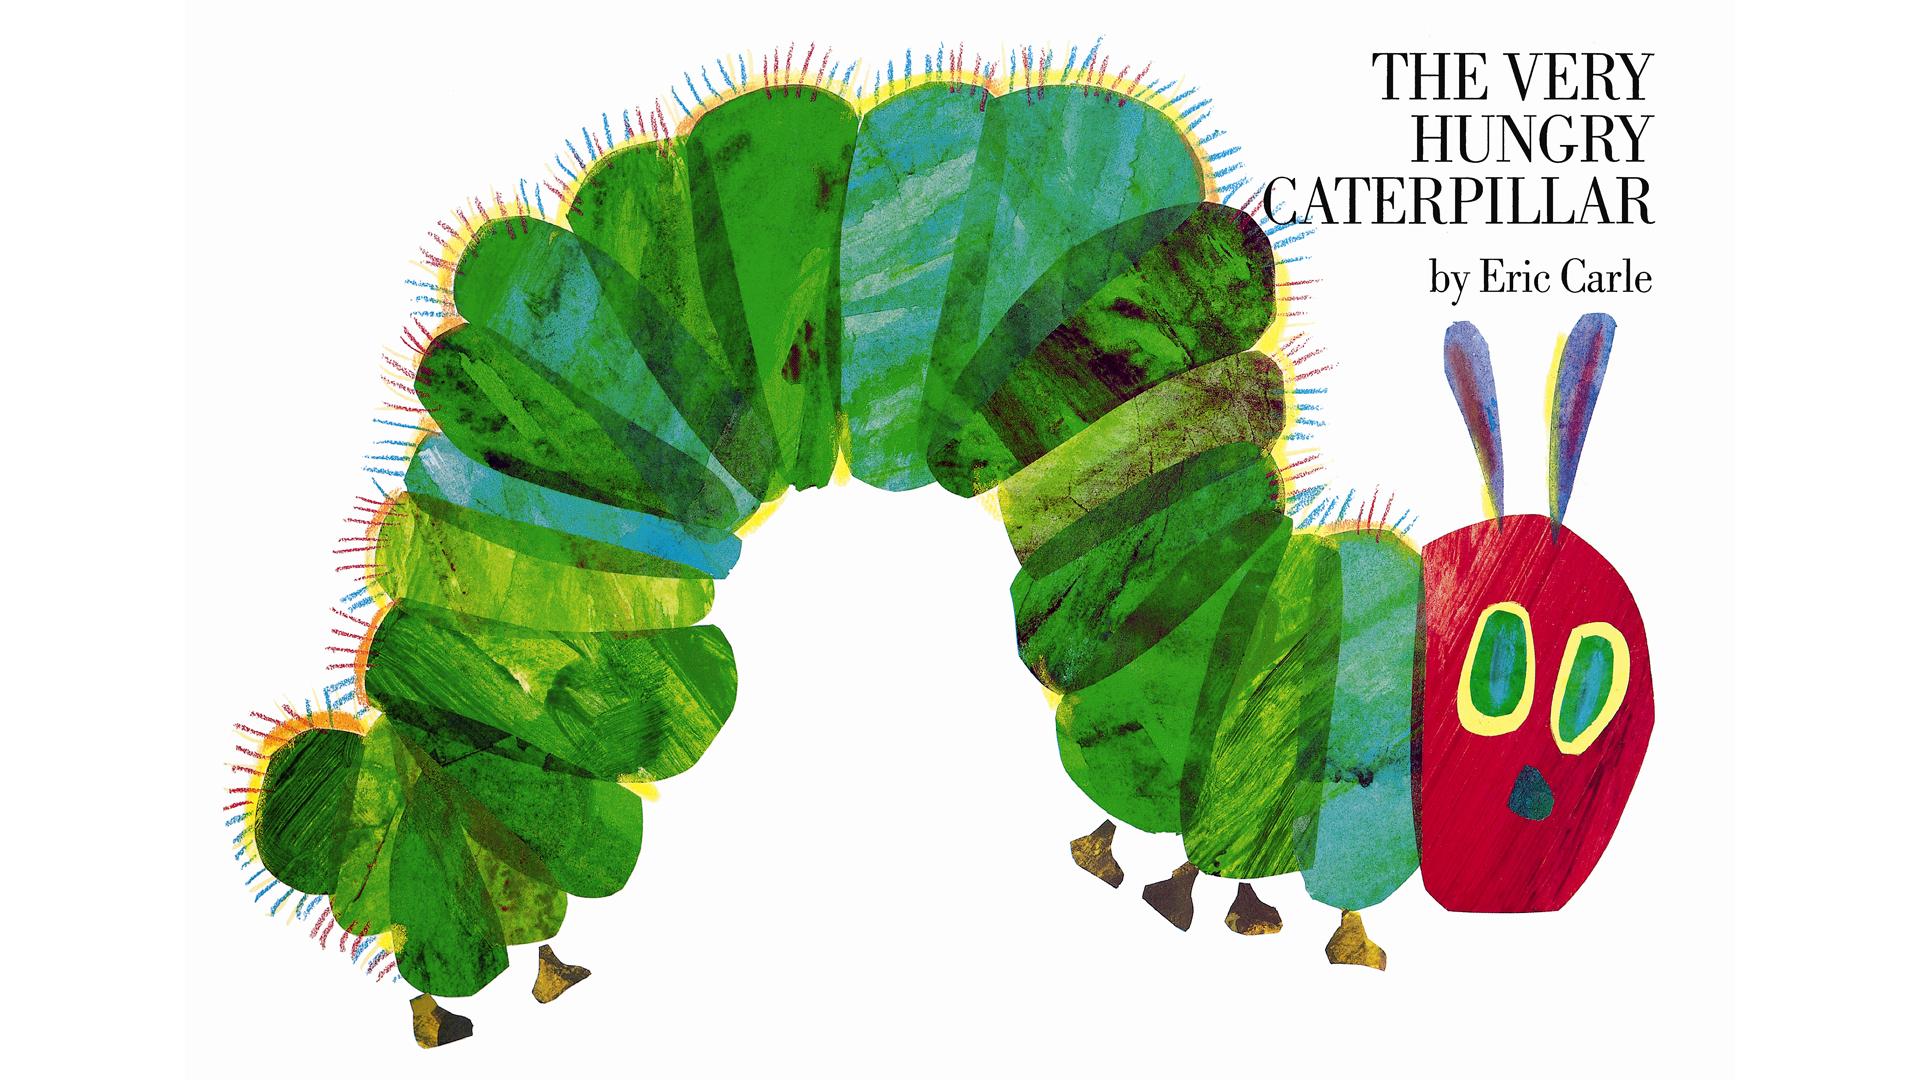 Common sense media just. Literacy clipart book reading caterpillar